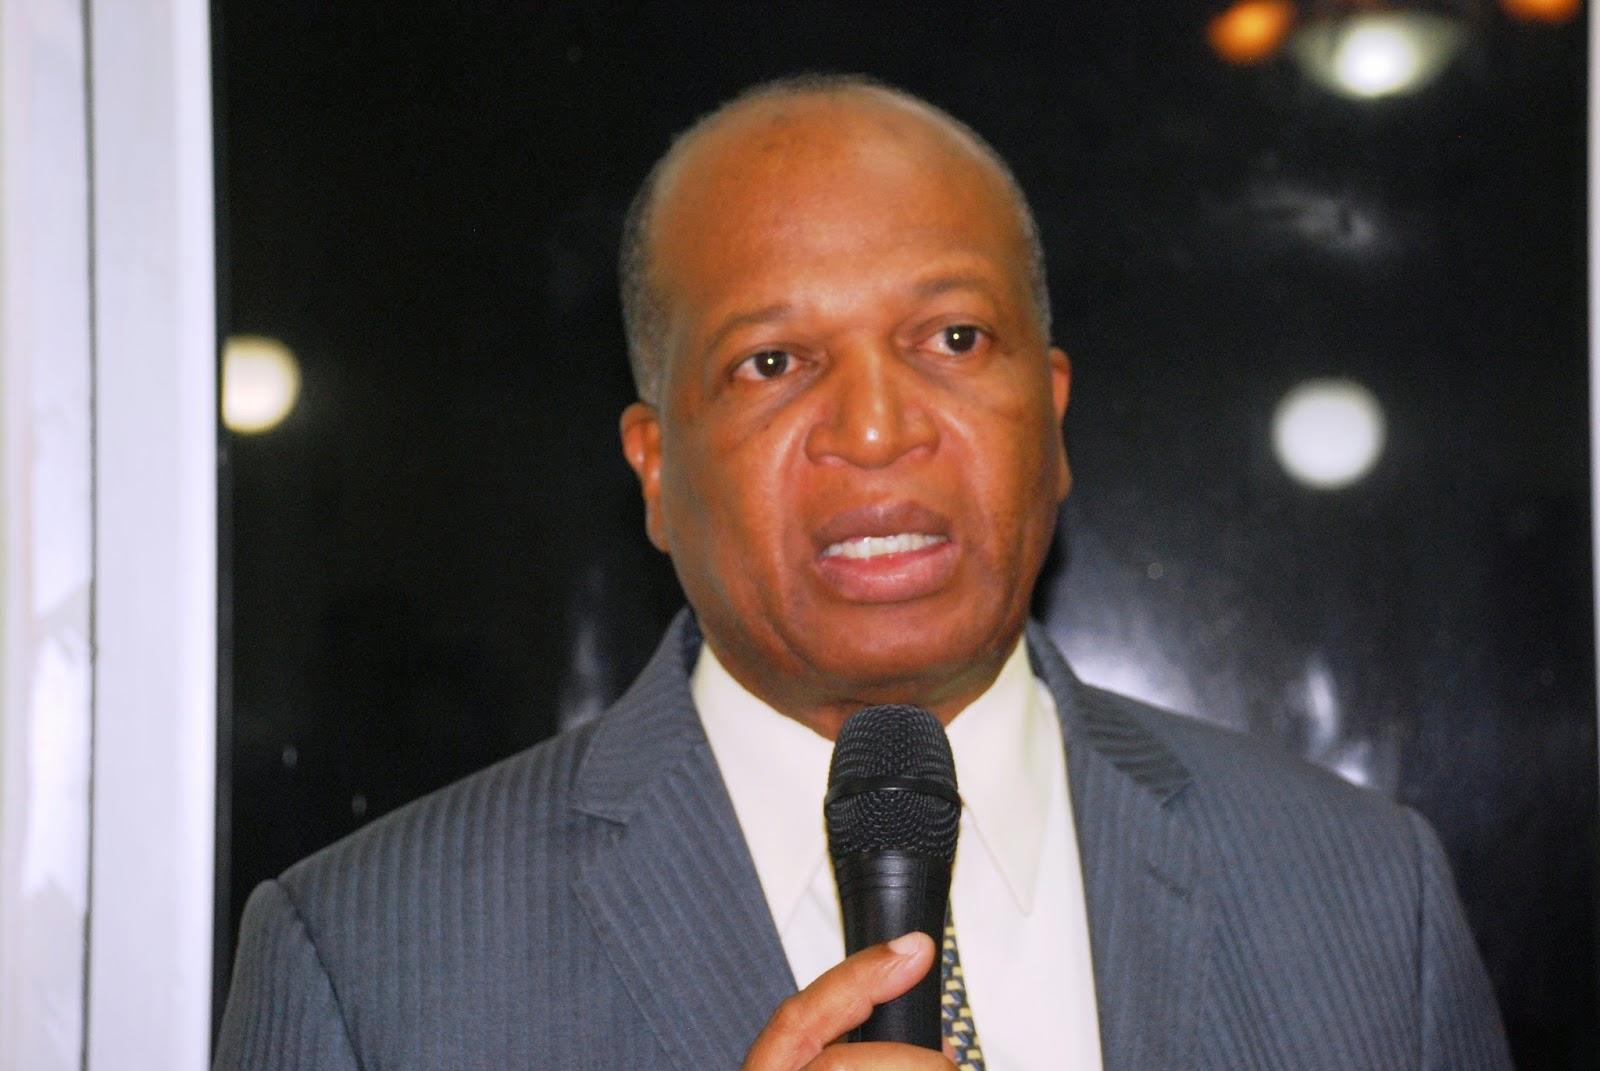 Director OTTT lamenta asesinato Juan de los Santos